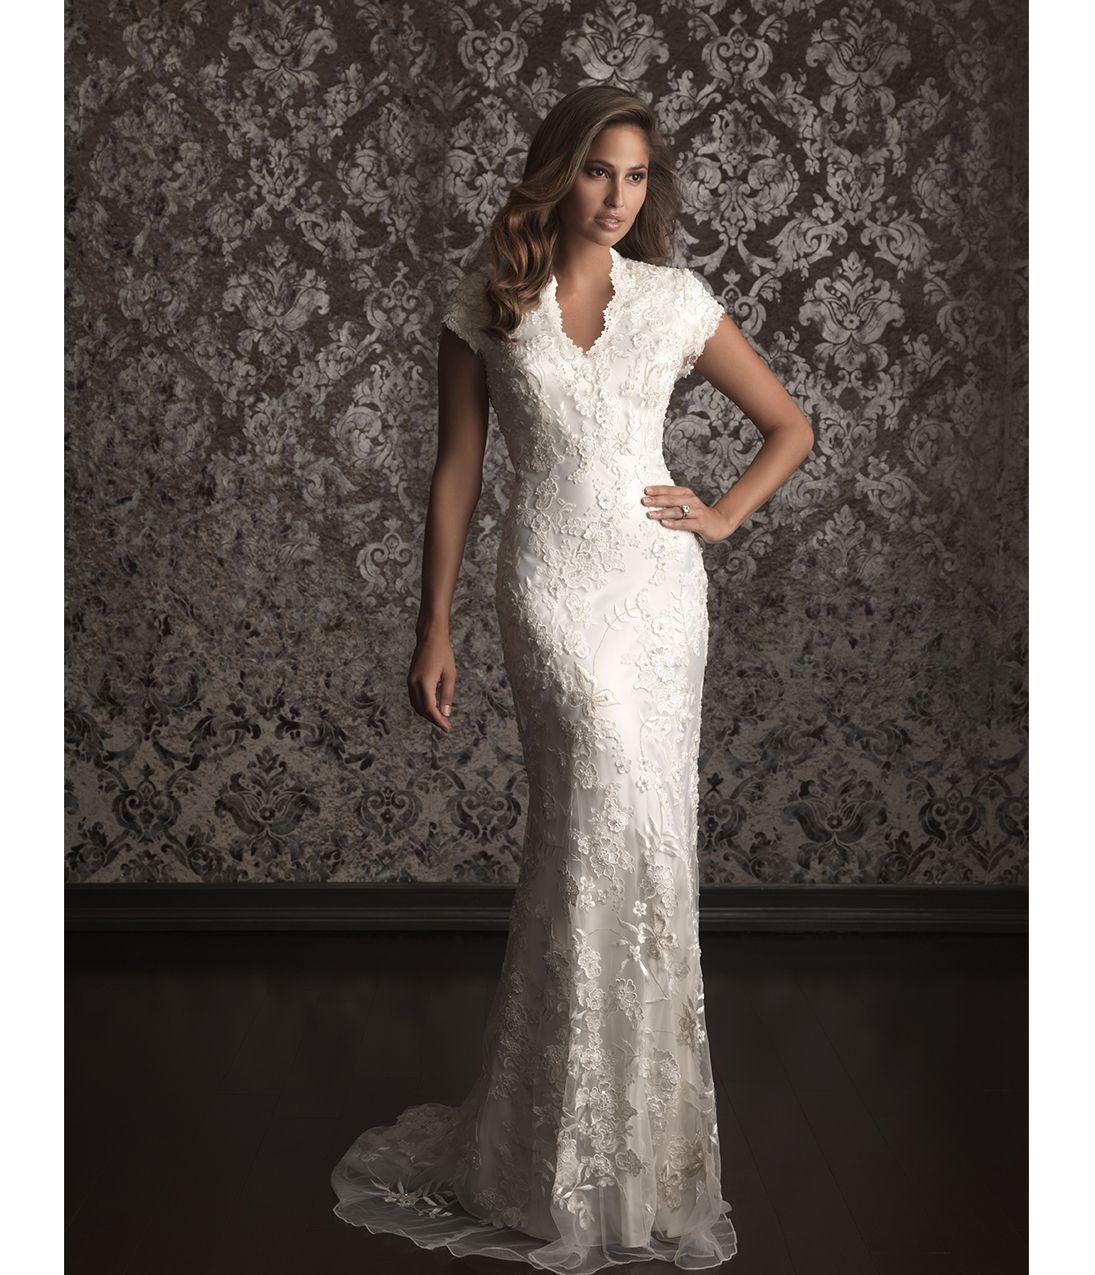 Allure Modest Wedding Gowns: Modest Wedding Dresses, Modest Wedding